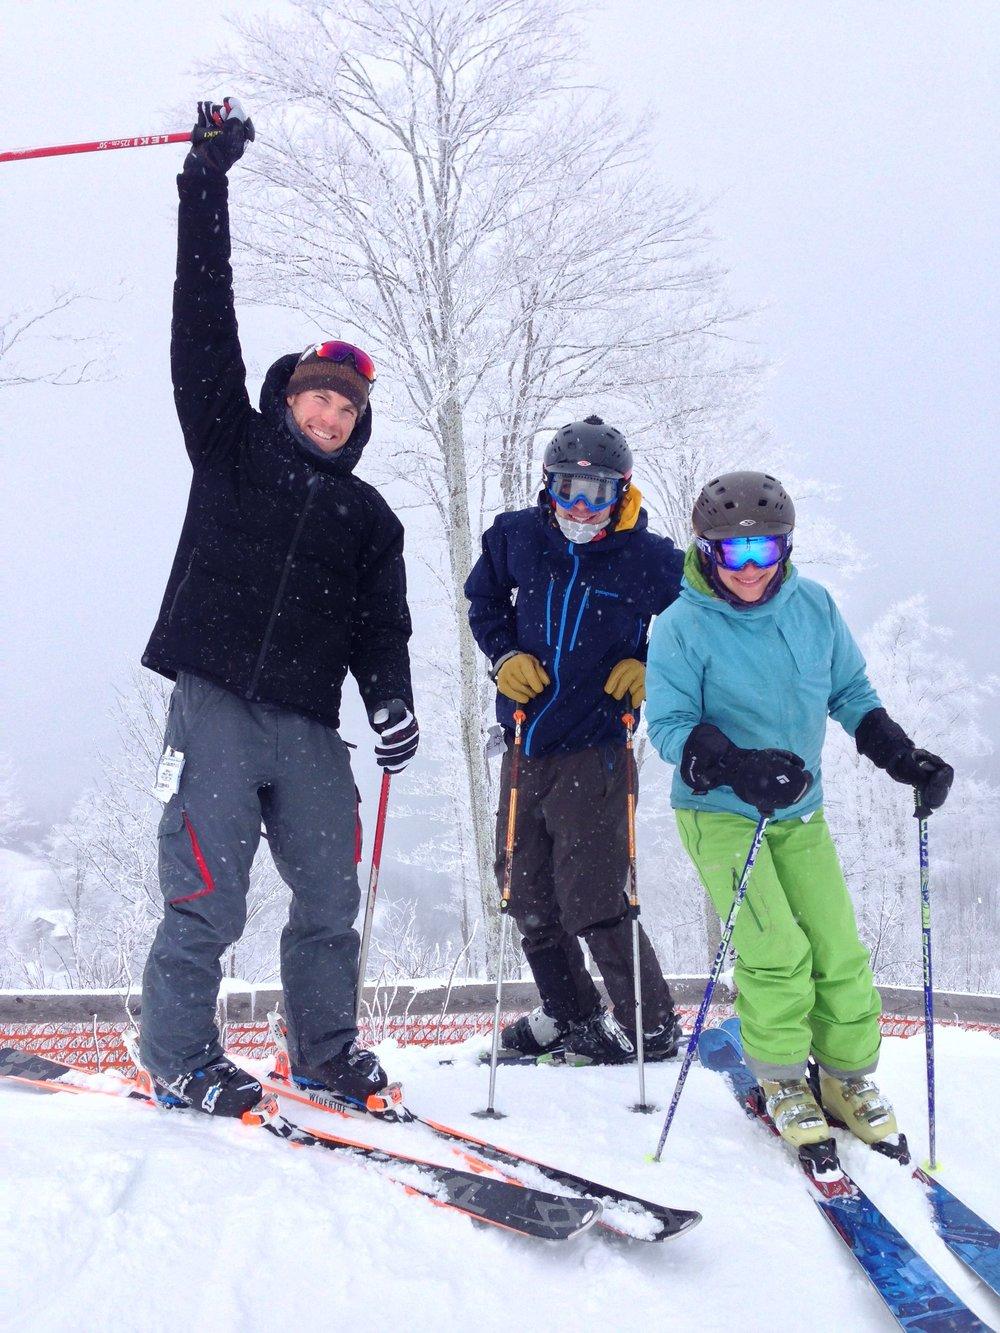 Brent-skiing-4.jpg